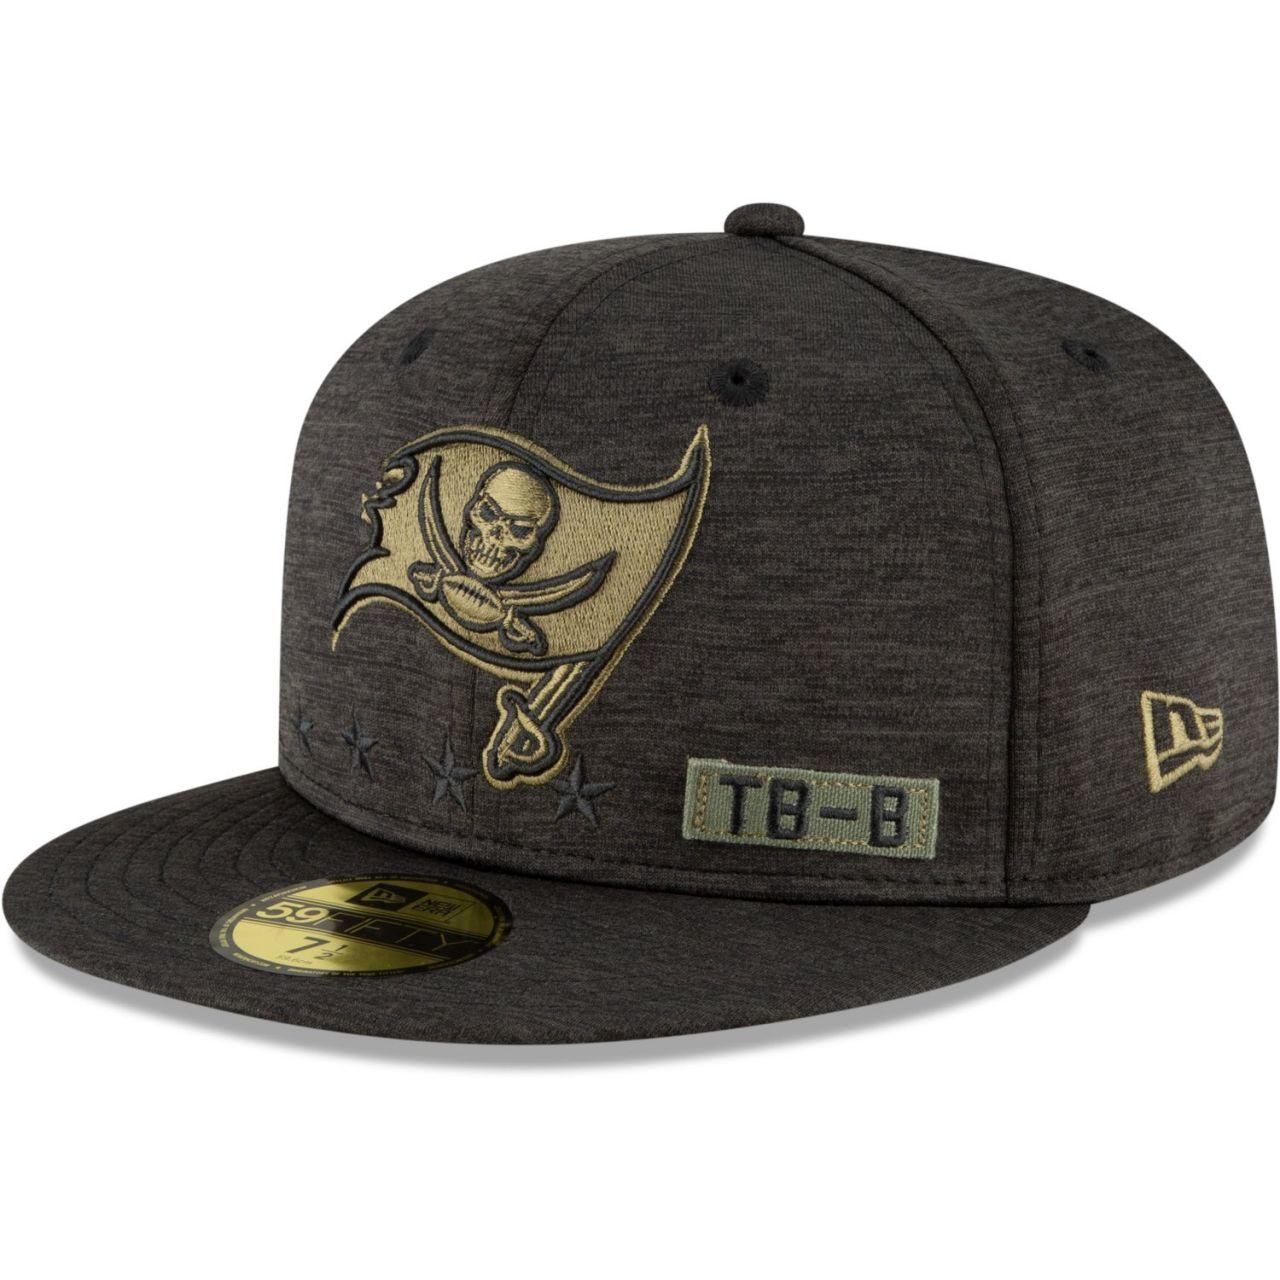 amfoo - New Era 59FIFTY Cap Salute to Service Tampa Bay Buccaneers